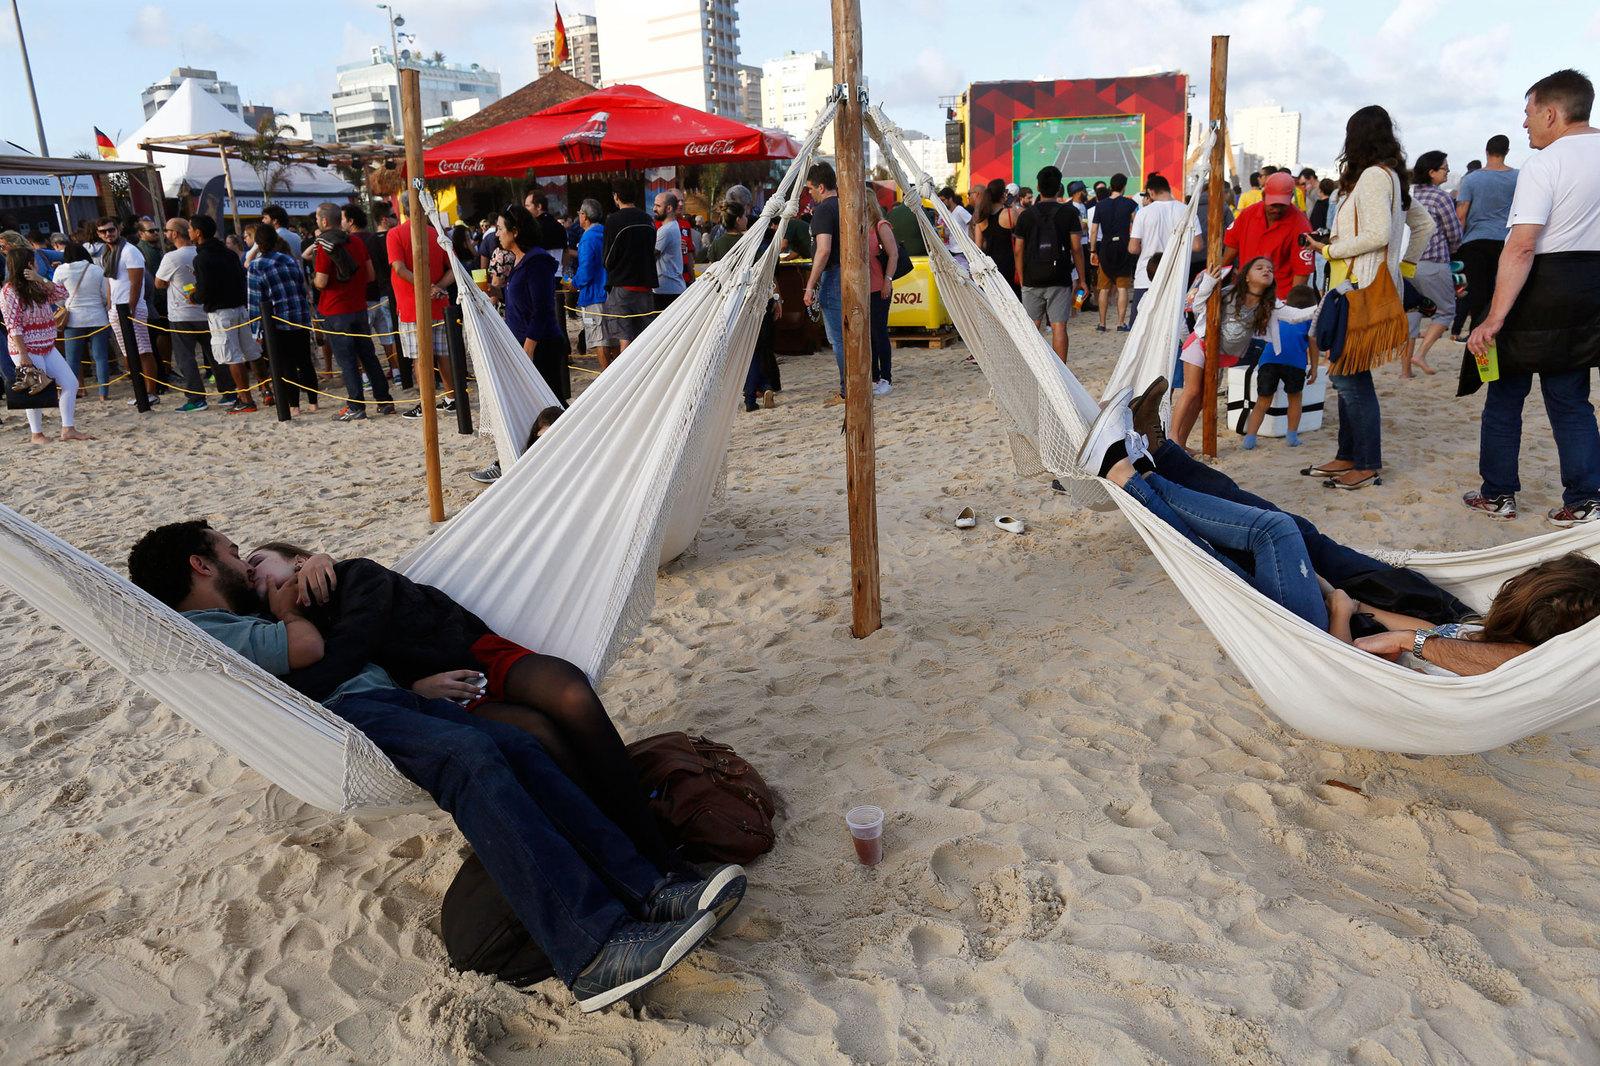 Фан-злна на пляже оборудована удобными гамаками